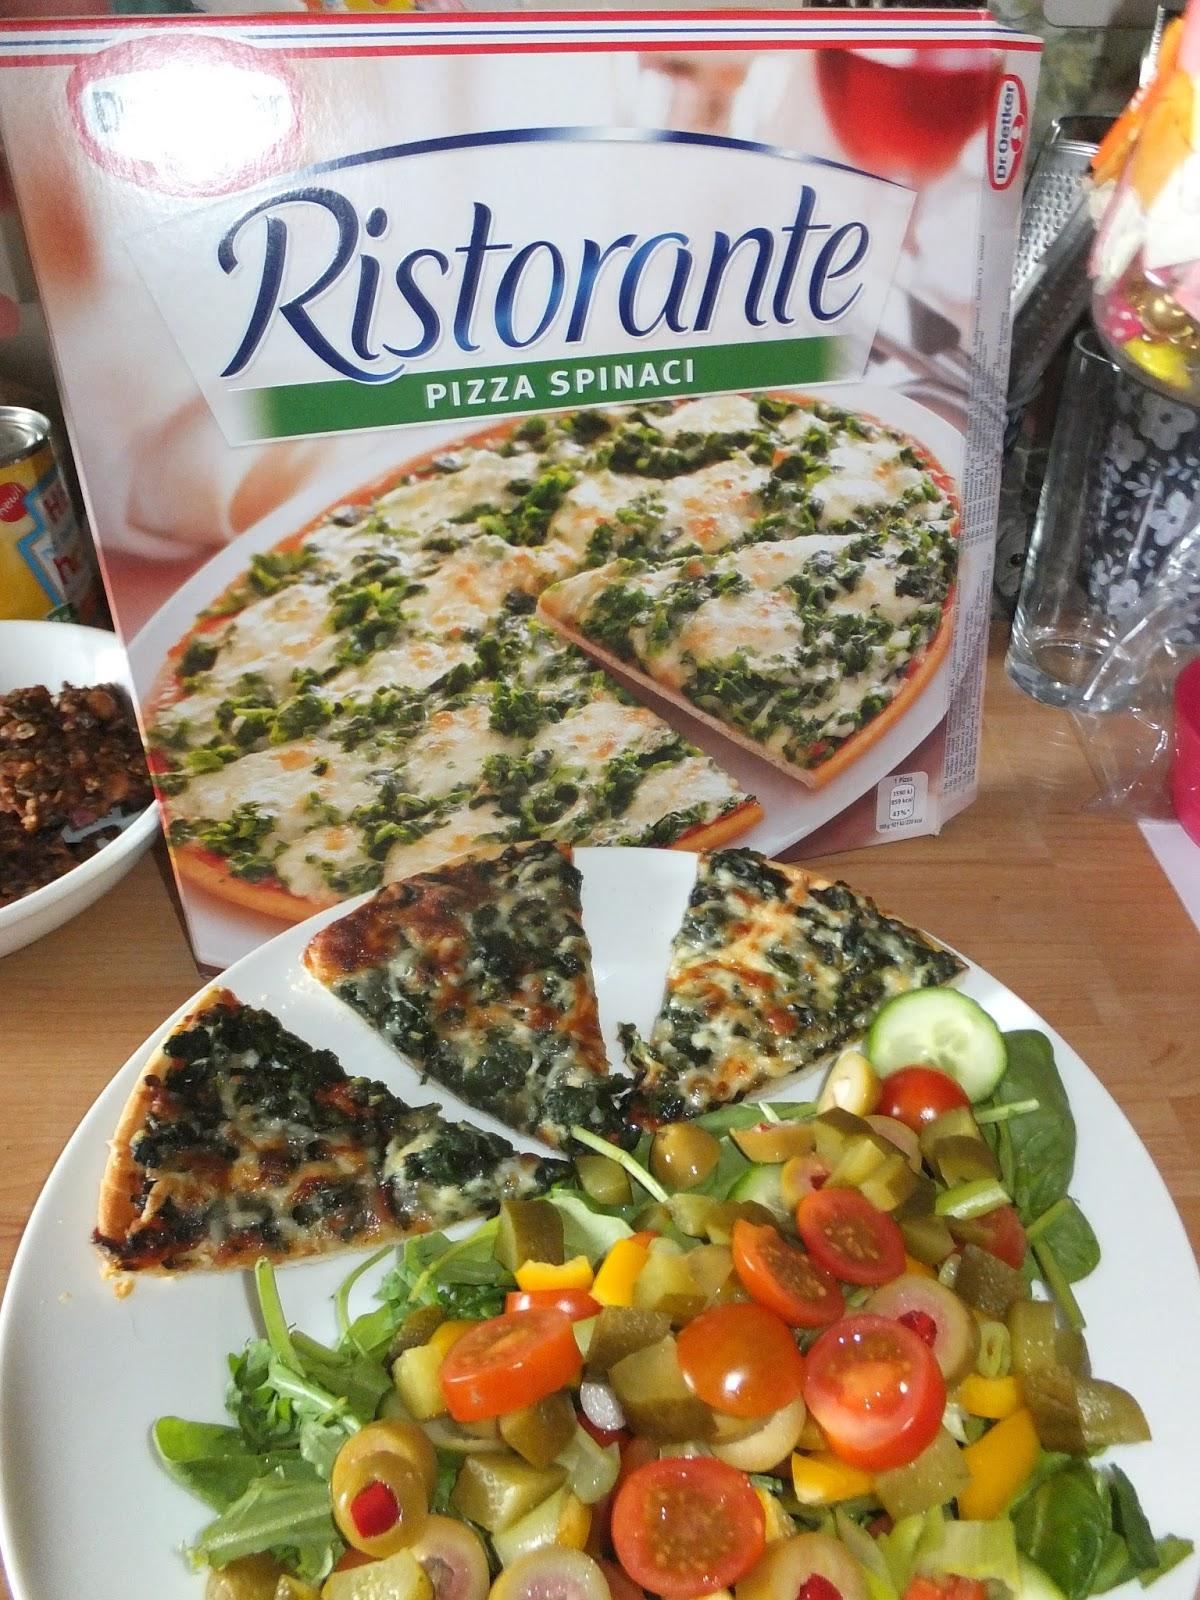 review pizza spinaci by dr oetker ristorante spinaciisback. Black Bedroom Furniture Sets. Home Design Ideas